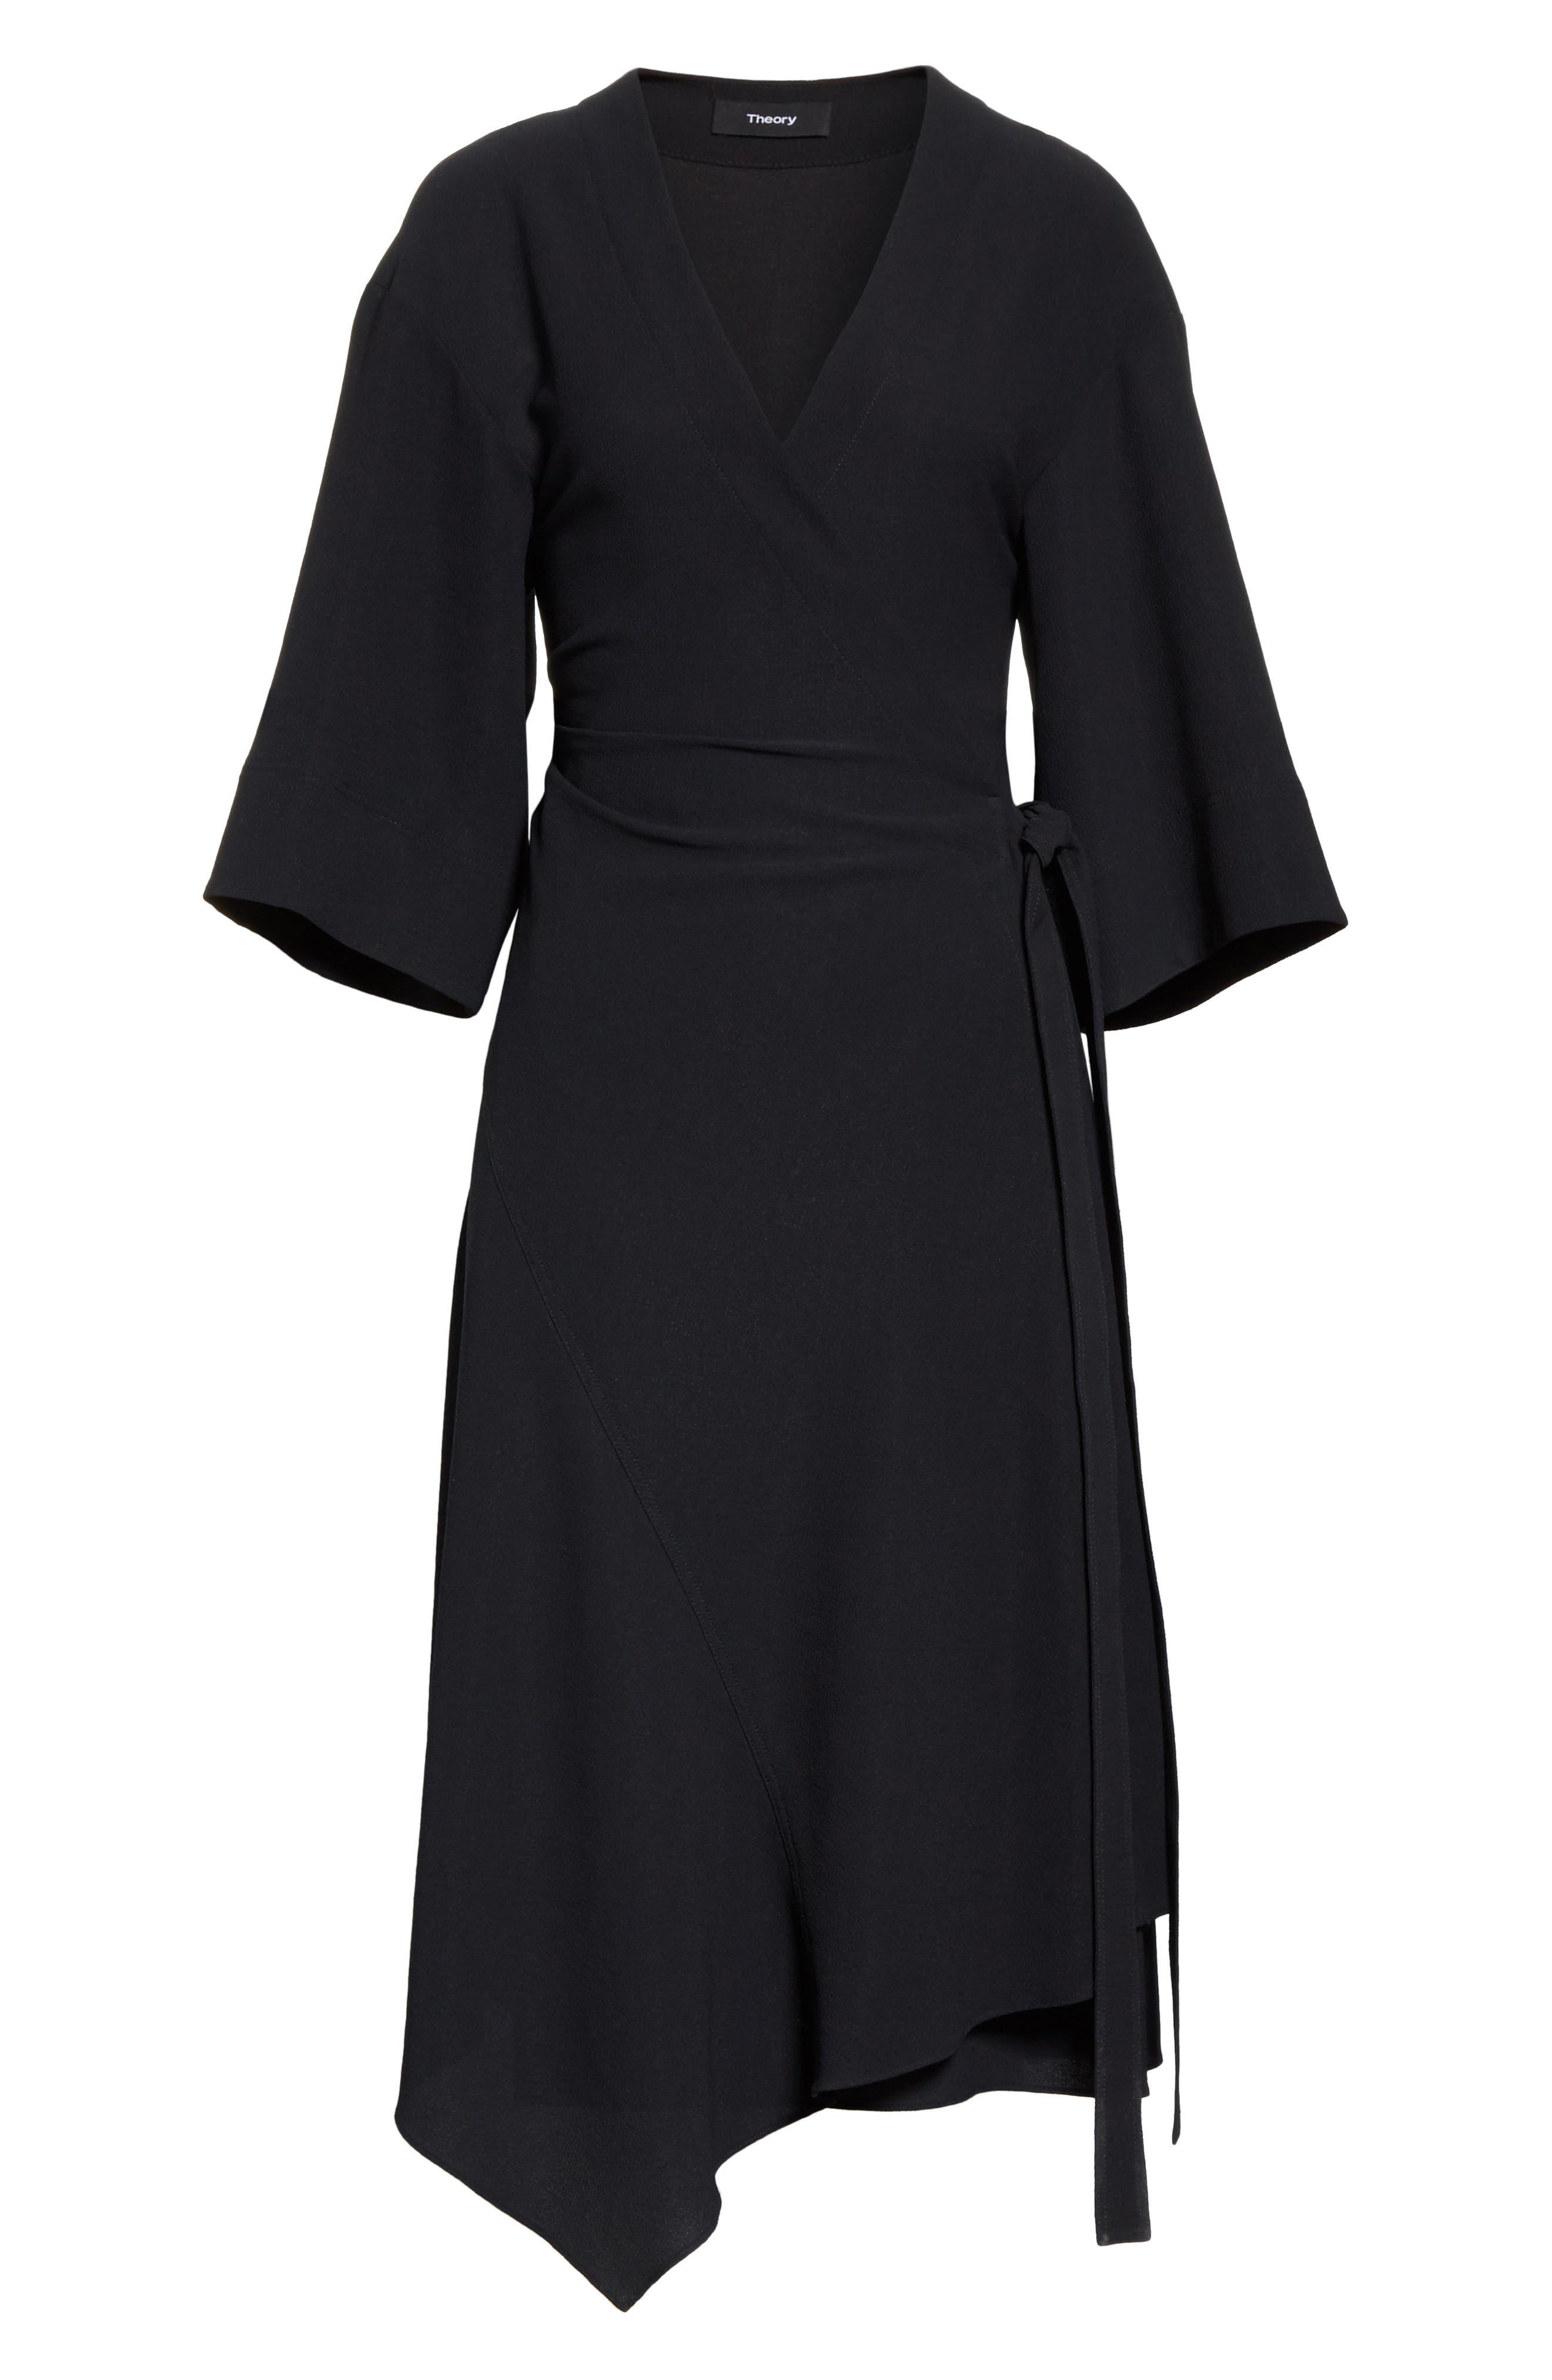 THEORY,                             Kimono Crepe Wrap Dress,                             Alternate thumbnail 6, color,                             001